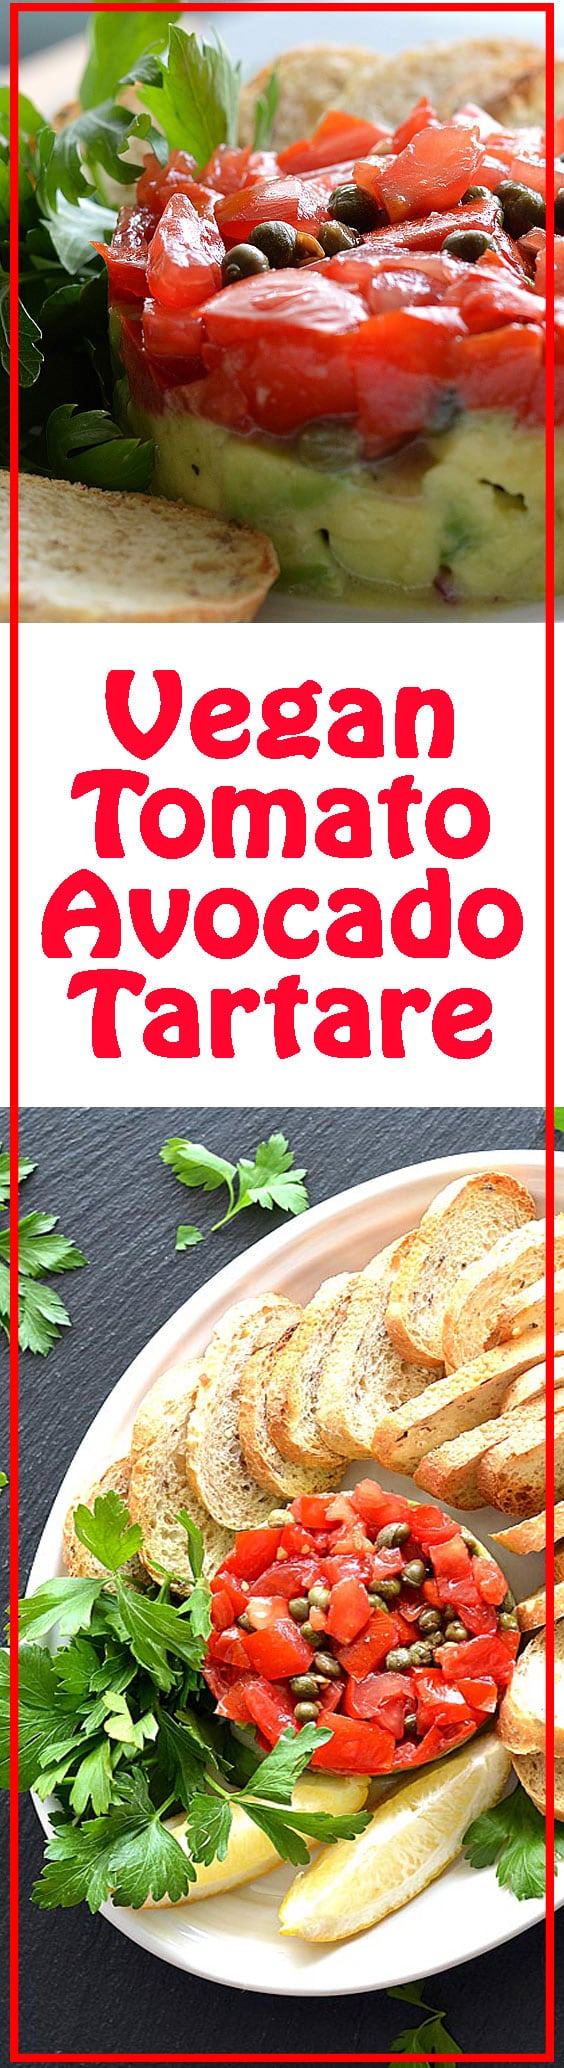 Tomato Avocado Tartare